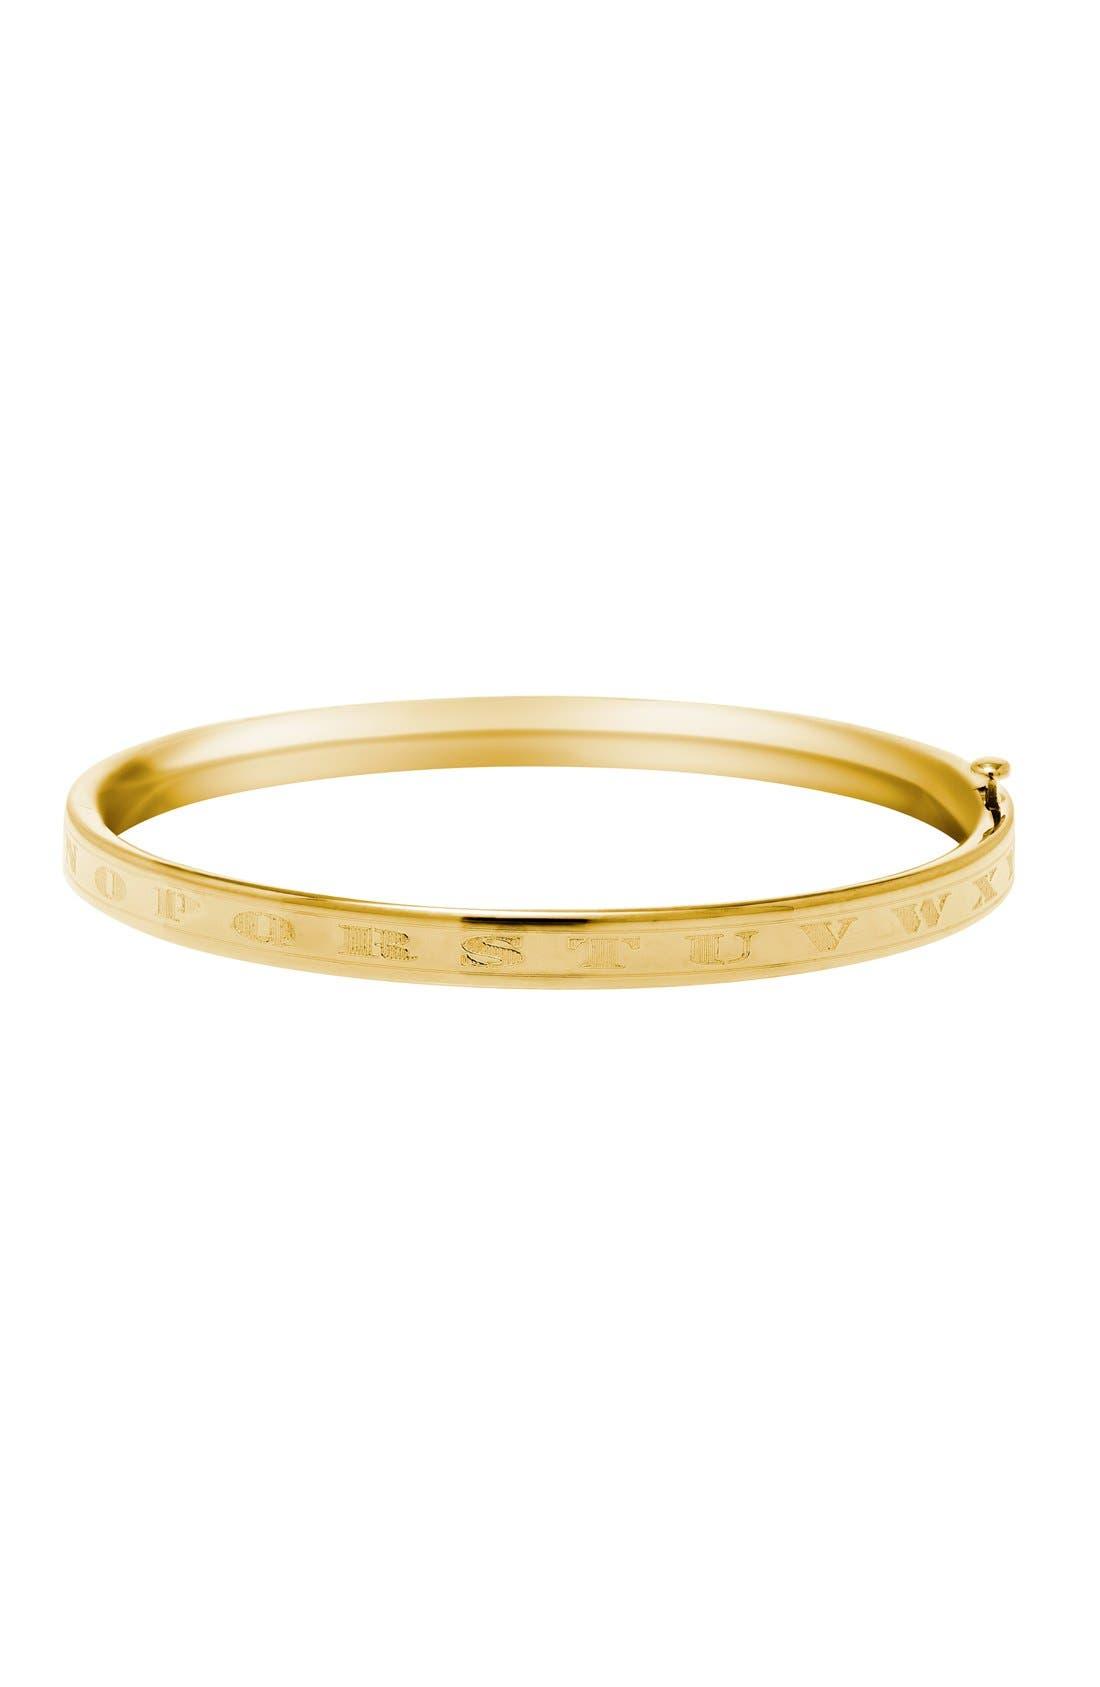 Alternate Image 1 Selected - Mignonette 'Alpha Baby' Gold Bracelet (Baby Girls)